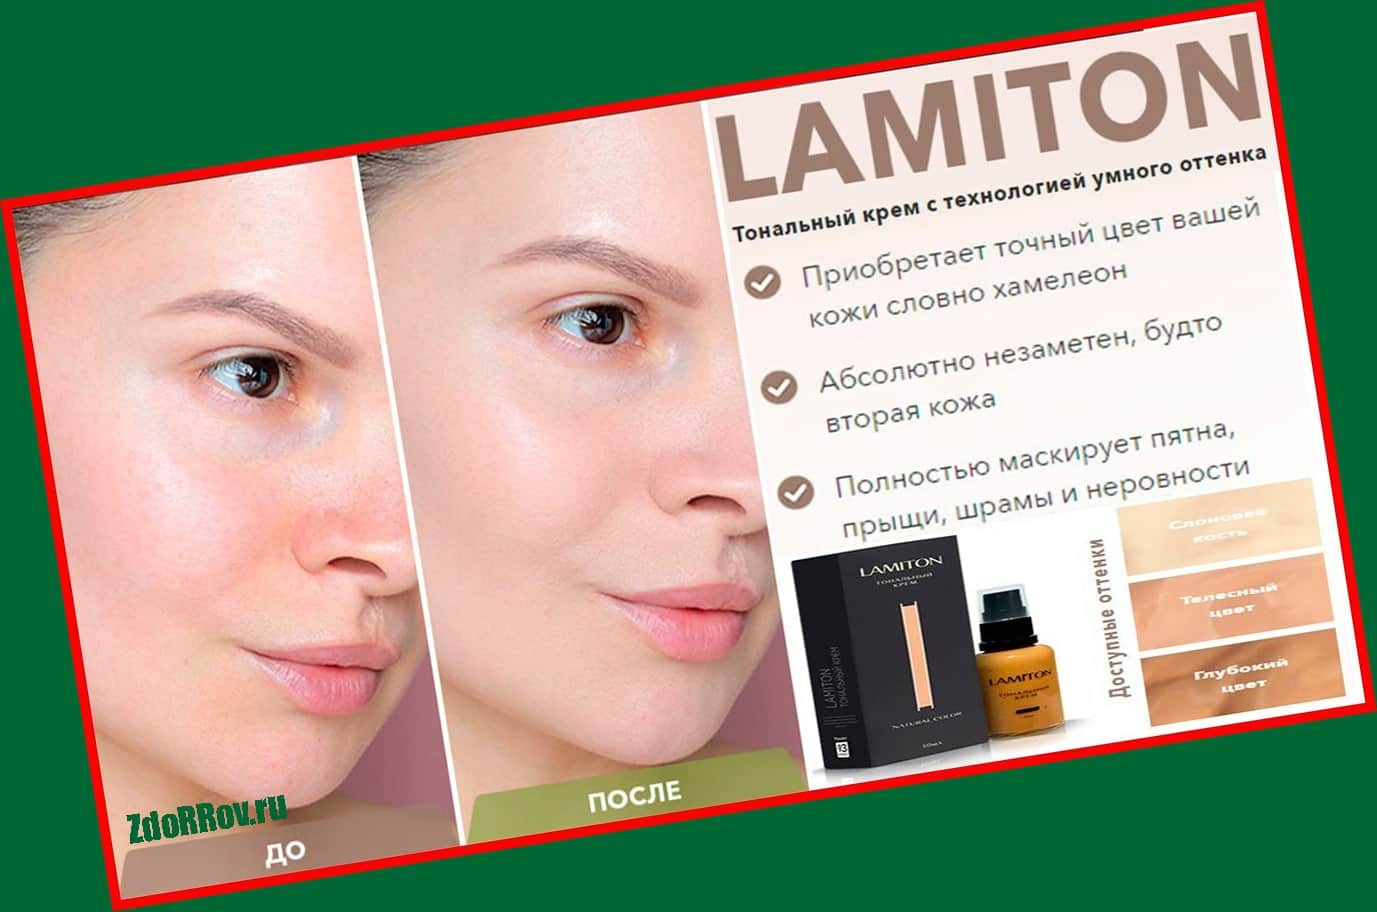 Преимущества Ламитон